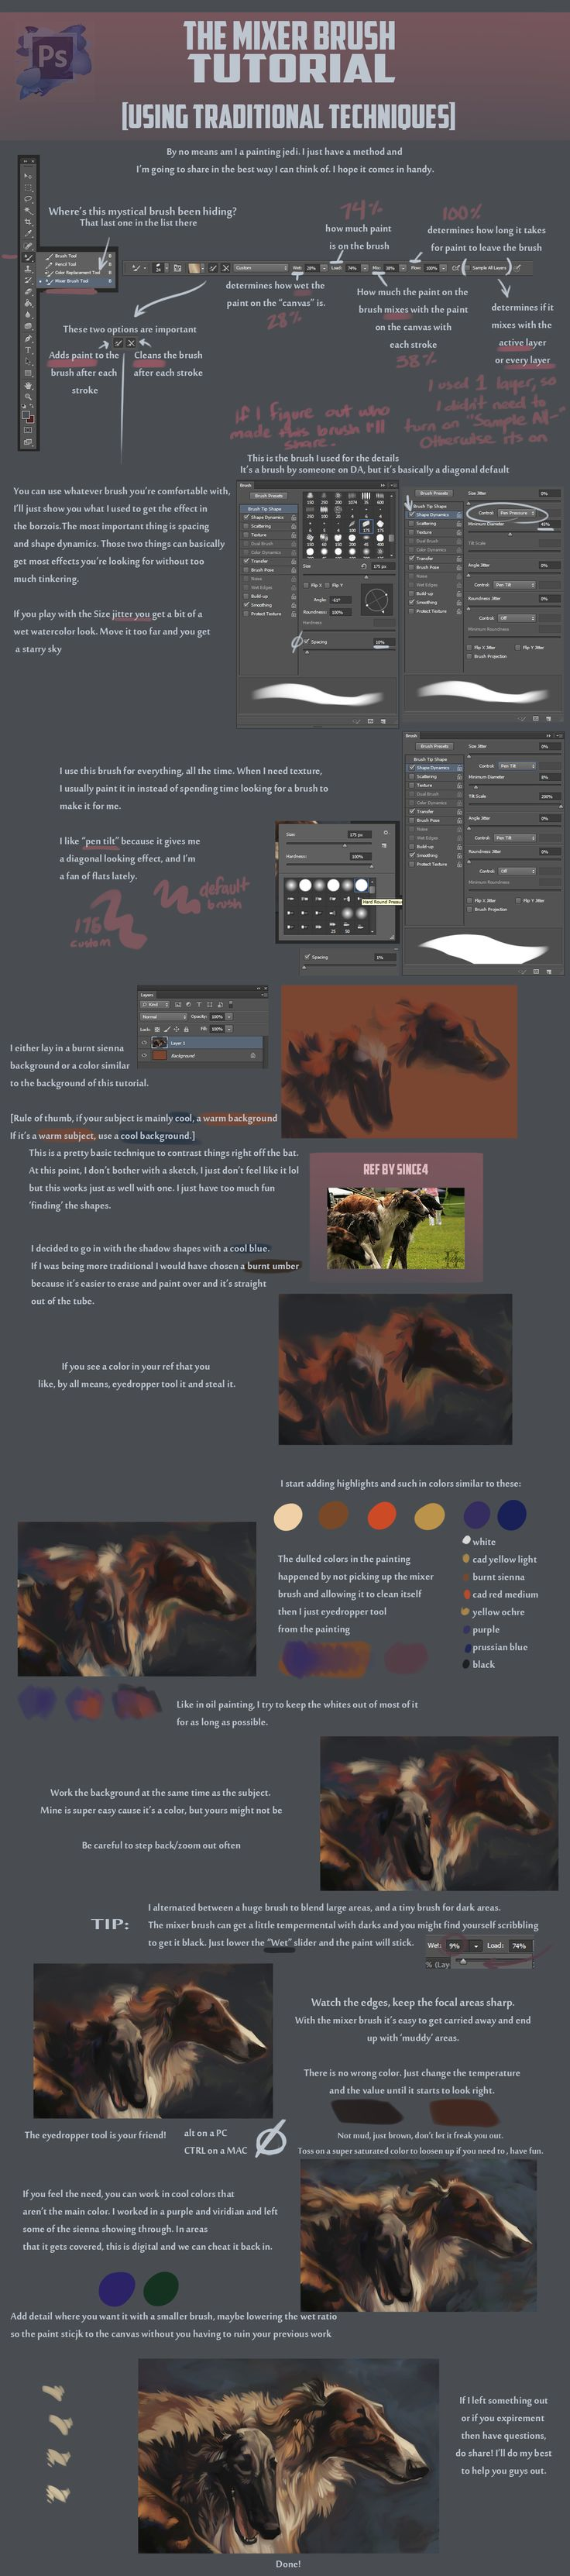 Watercolor art history brush cs6 - Mixer Brush Tutorial By Blackpassion777 On Deviantart